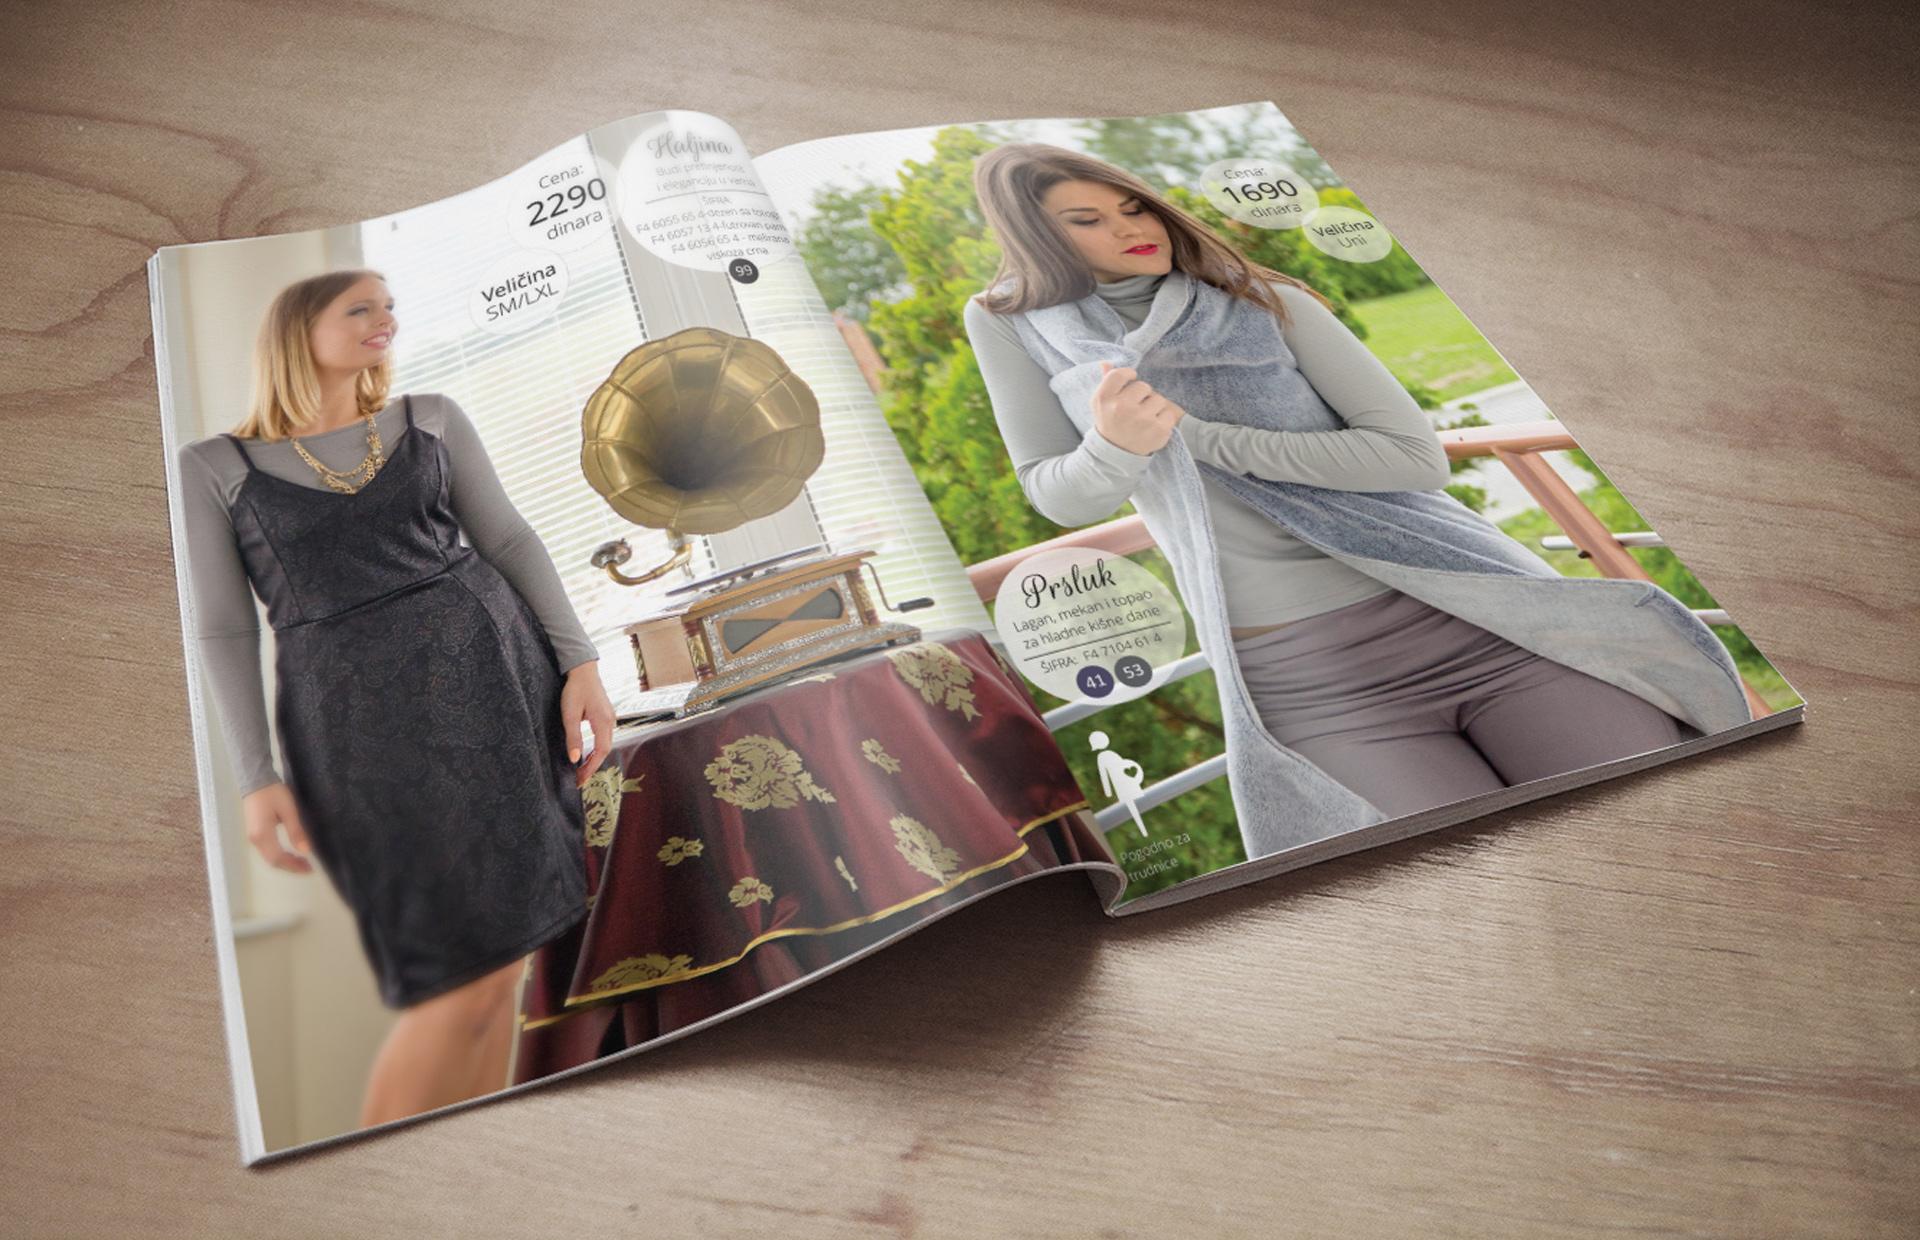 Katalog za NO-NO Factory za jesen/zimu 2014 unutrašnje strane